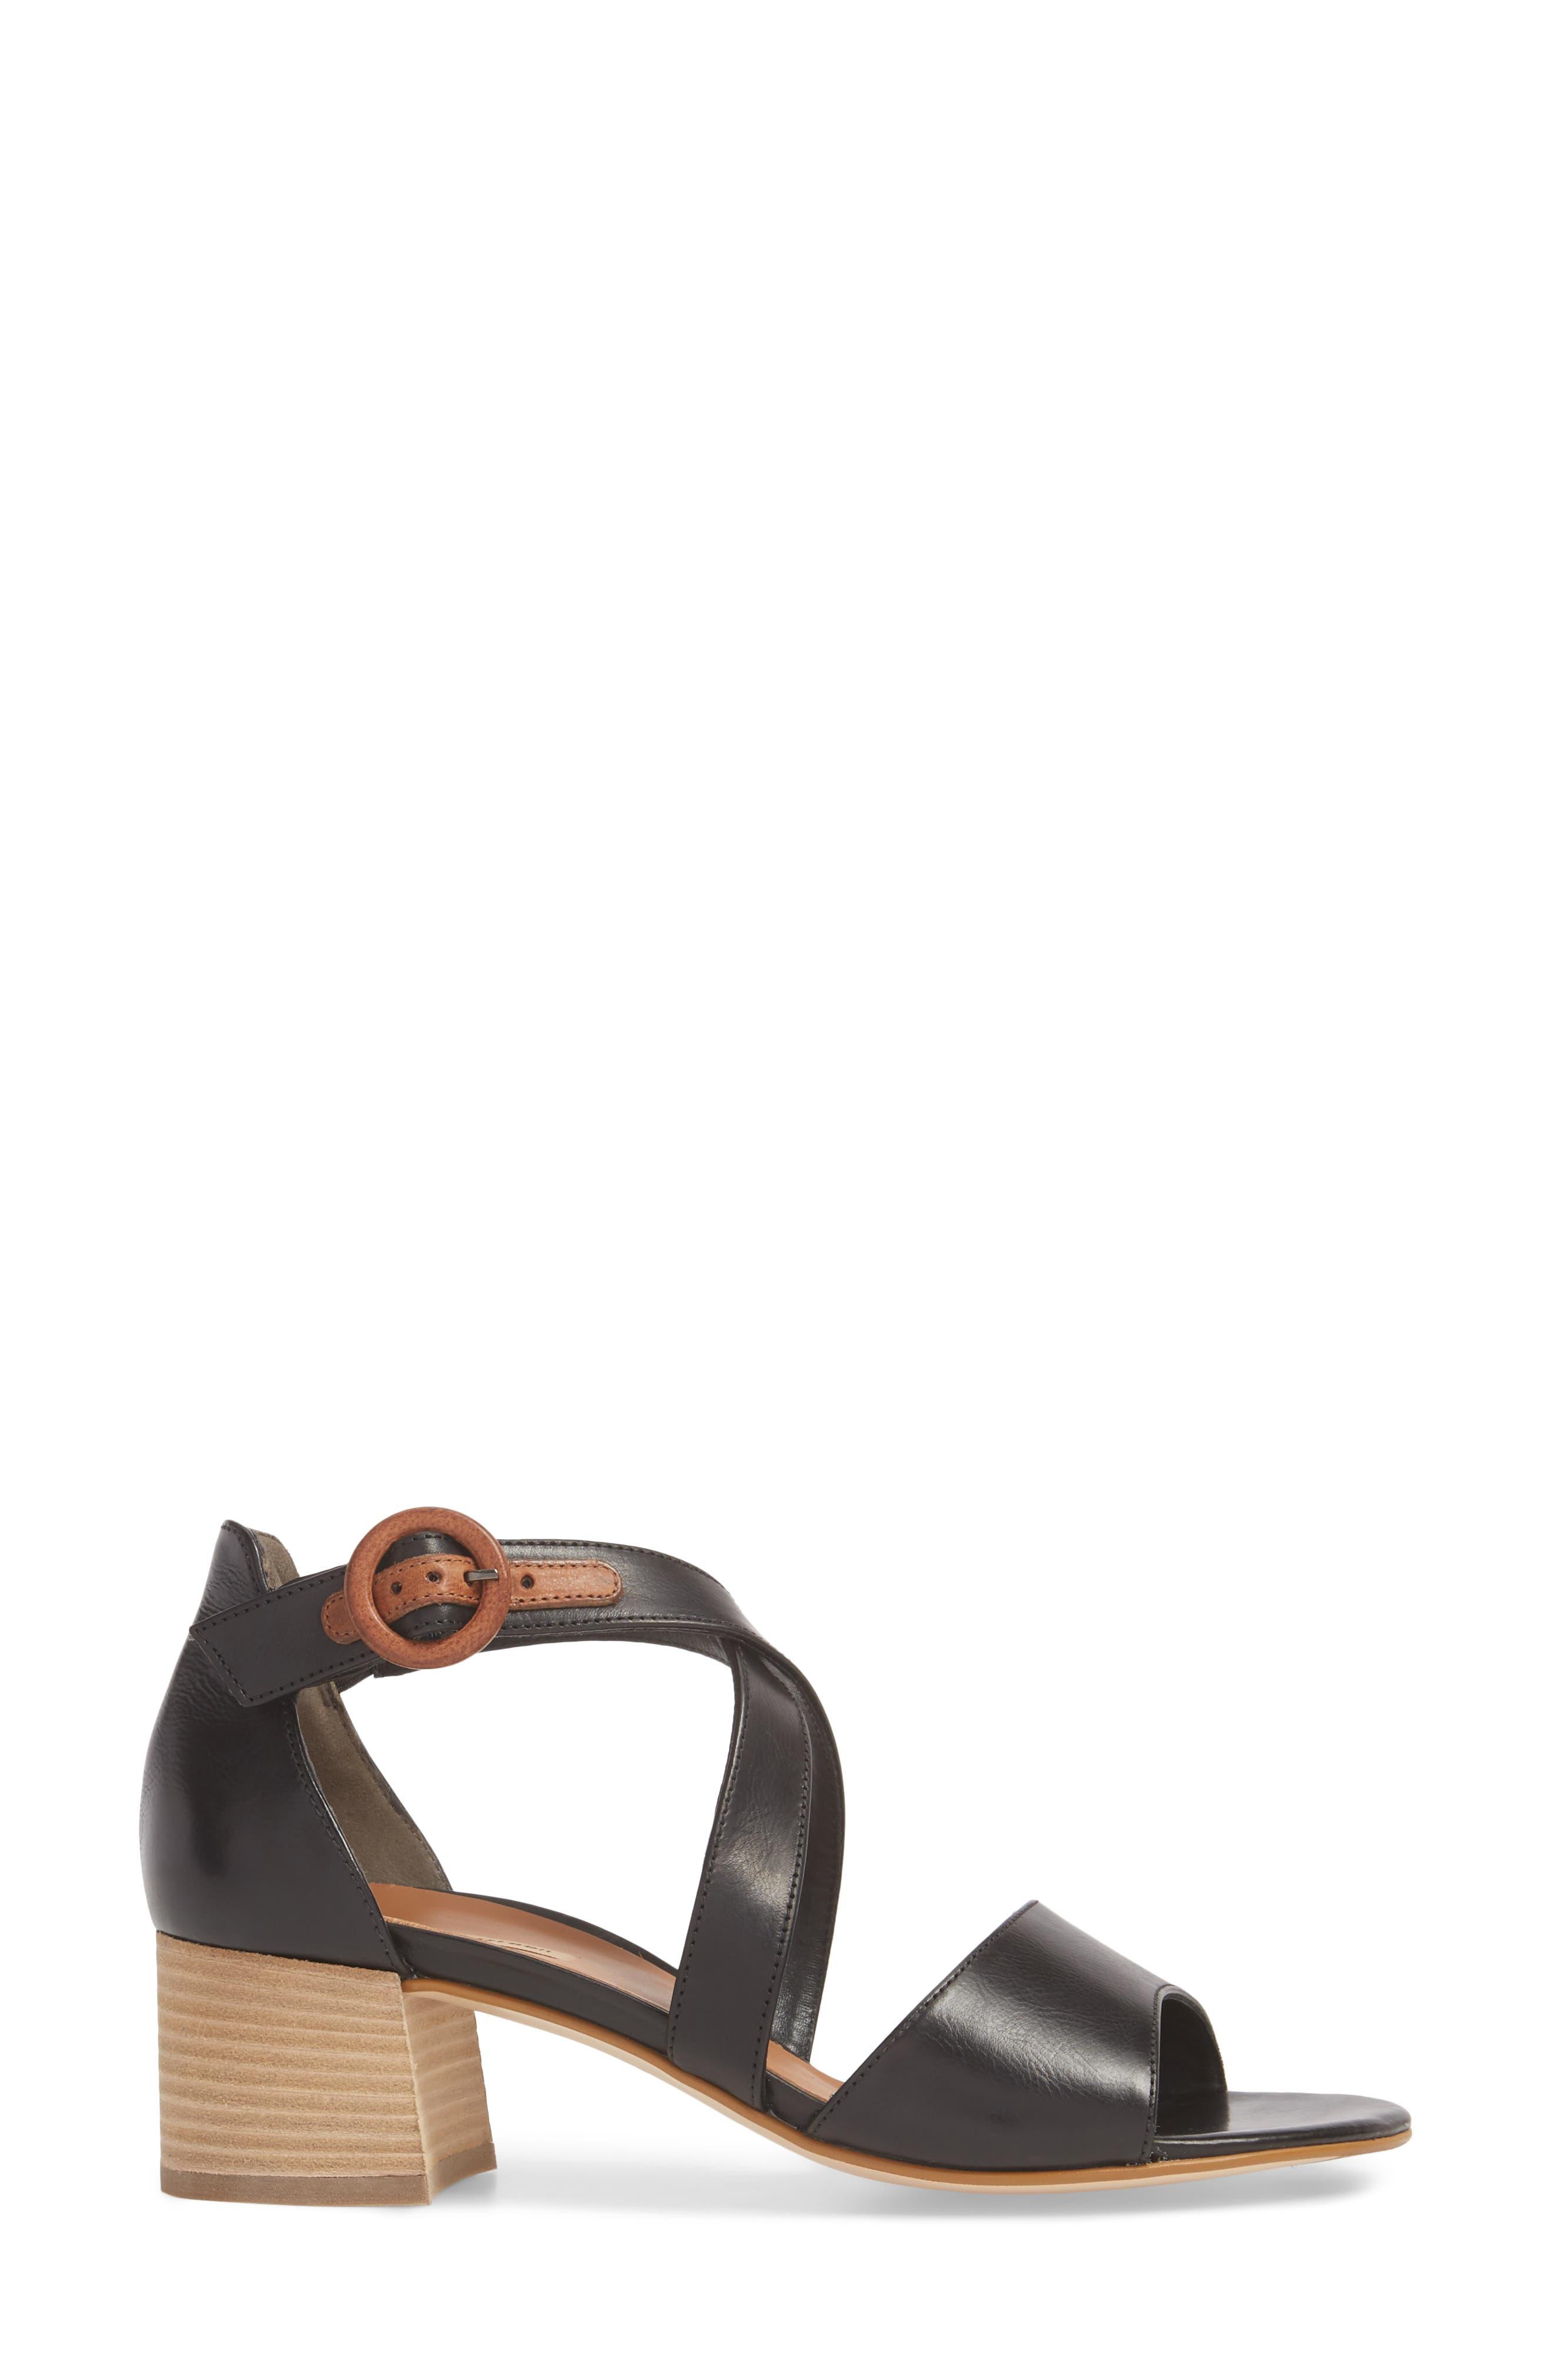 Sally Quarter Strap Sandal,                             Alternate thumbnail 3, color,                             BLACK LEATHER